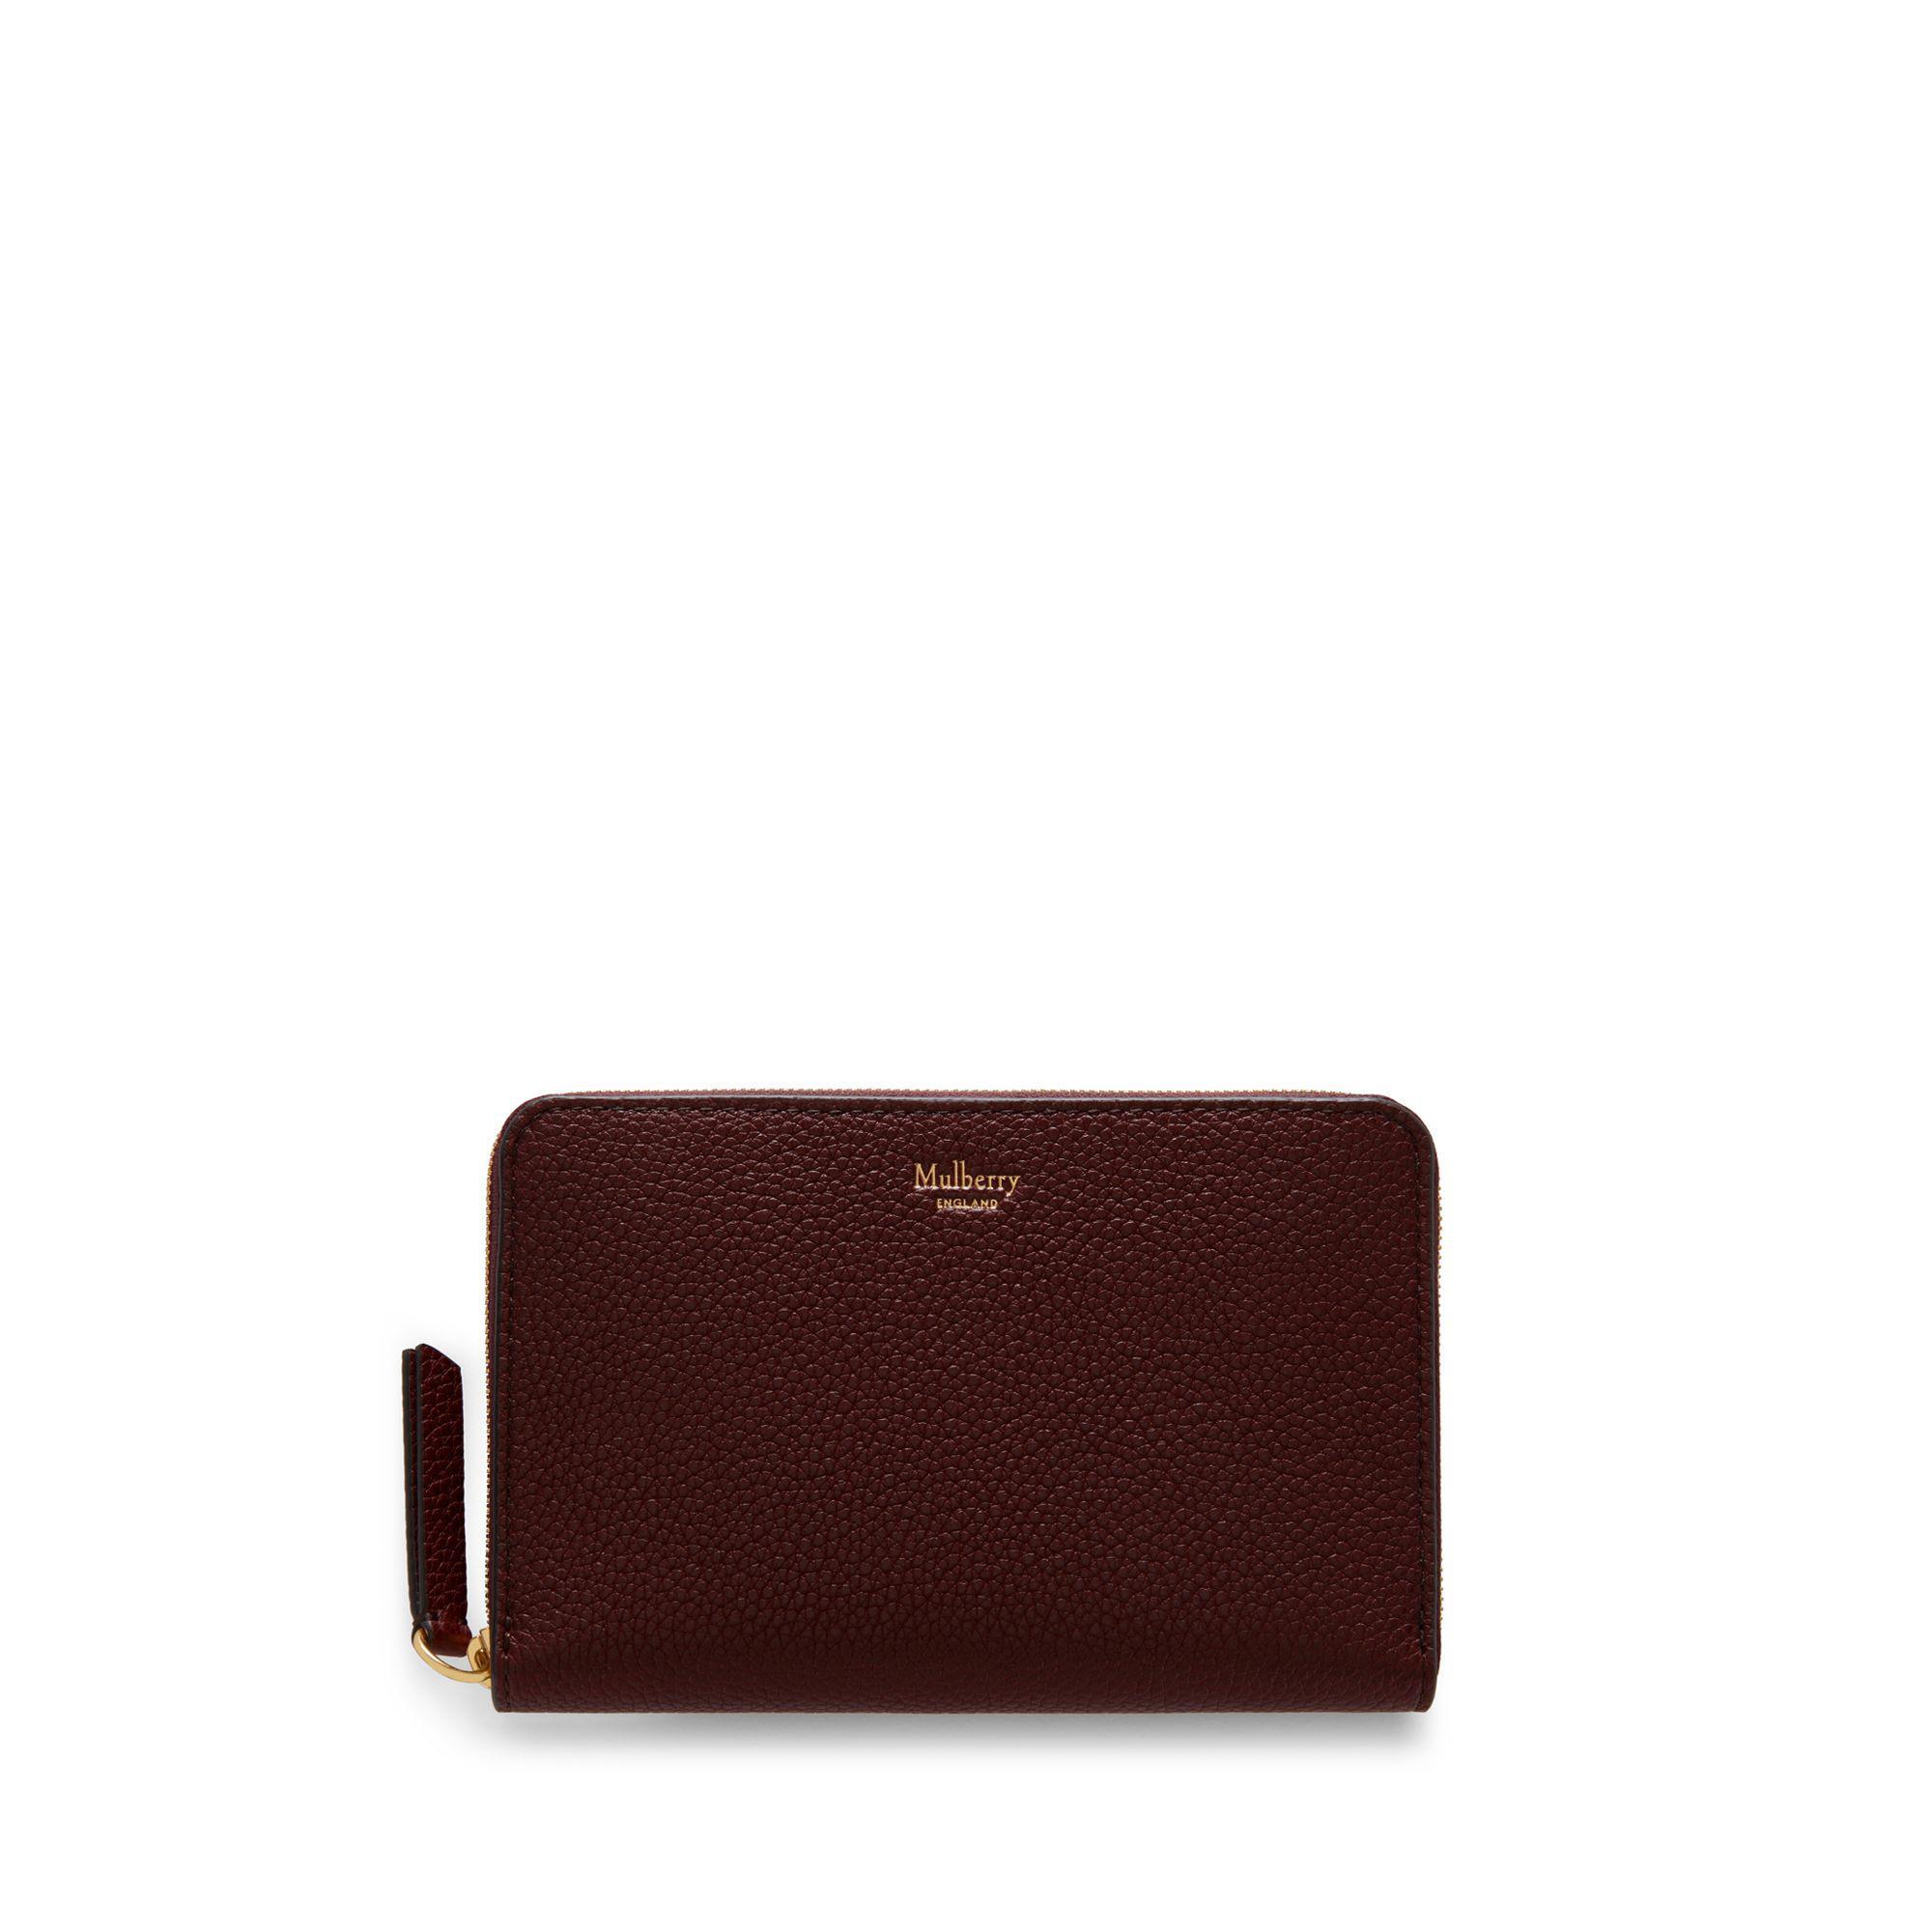 946017e41 Mulberry. Women's Medium Zip Around Wallet In Burgundy Small Classic Grain